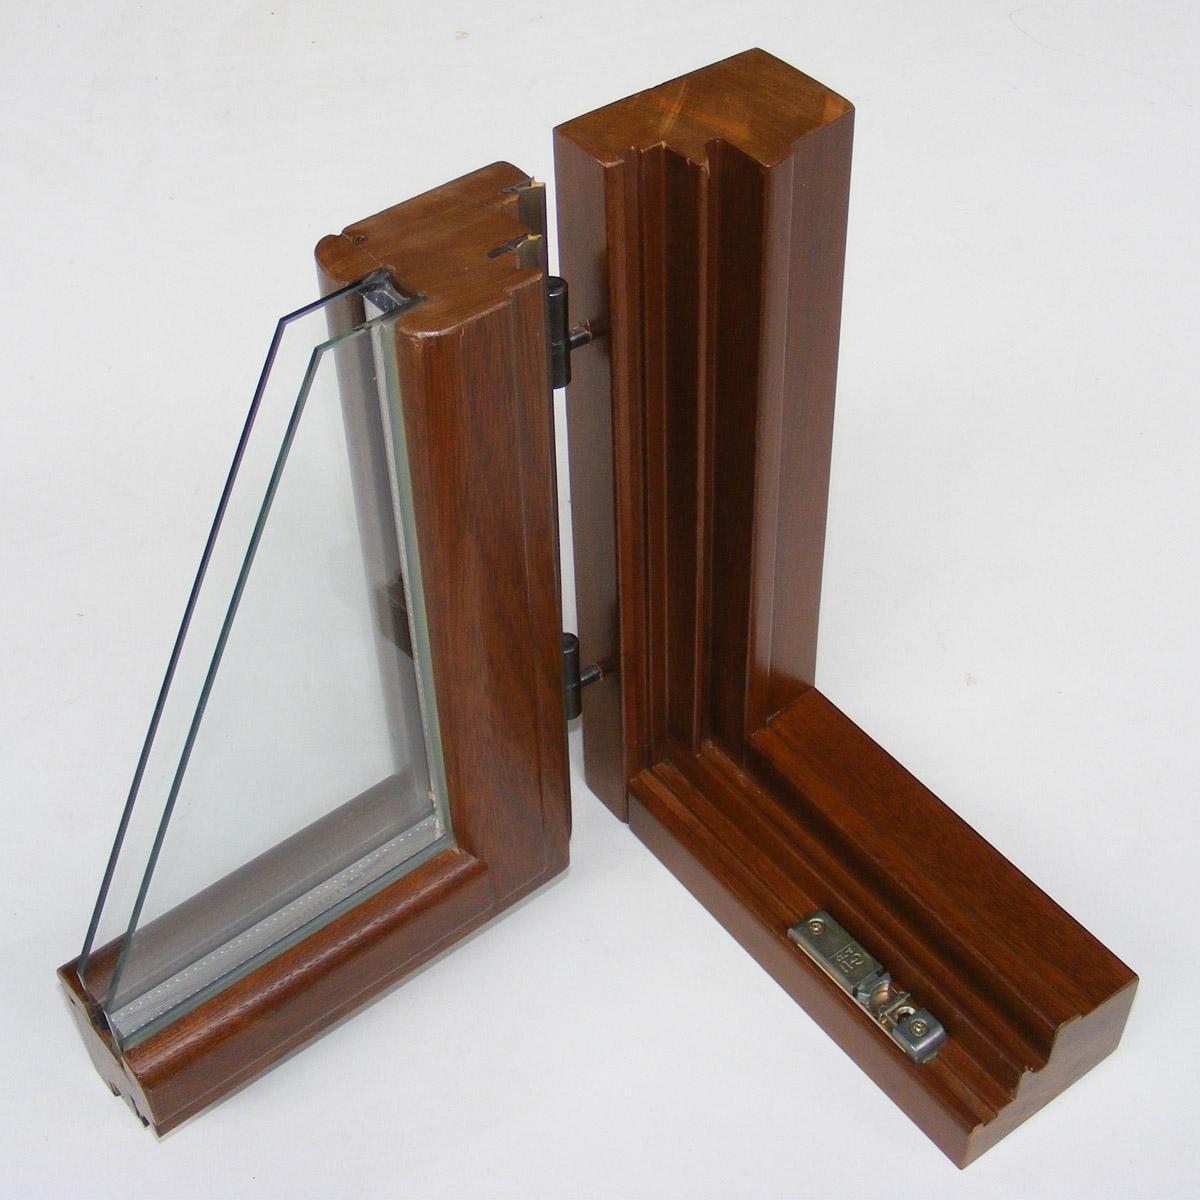 Barnizar ventanas de madera elegir protectores o barnices - Barnizar madera exterior ...